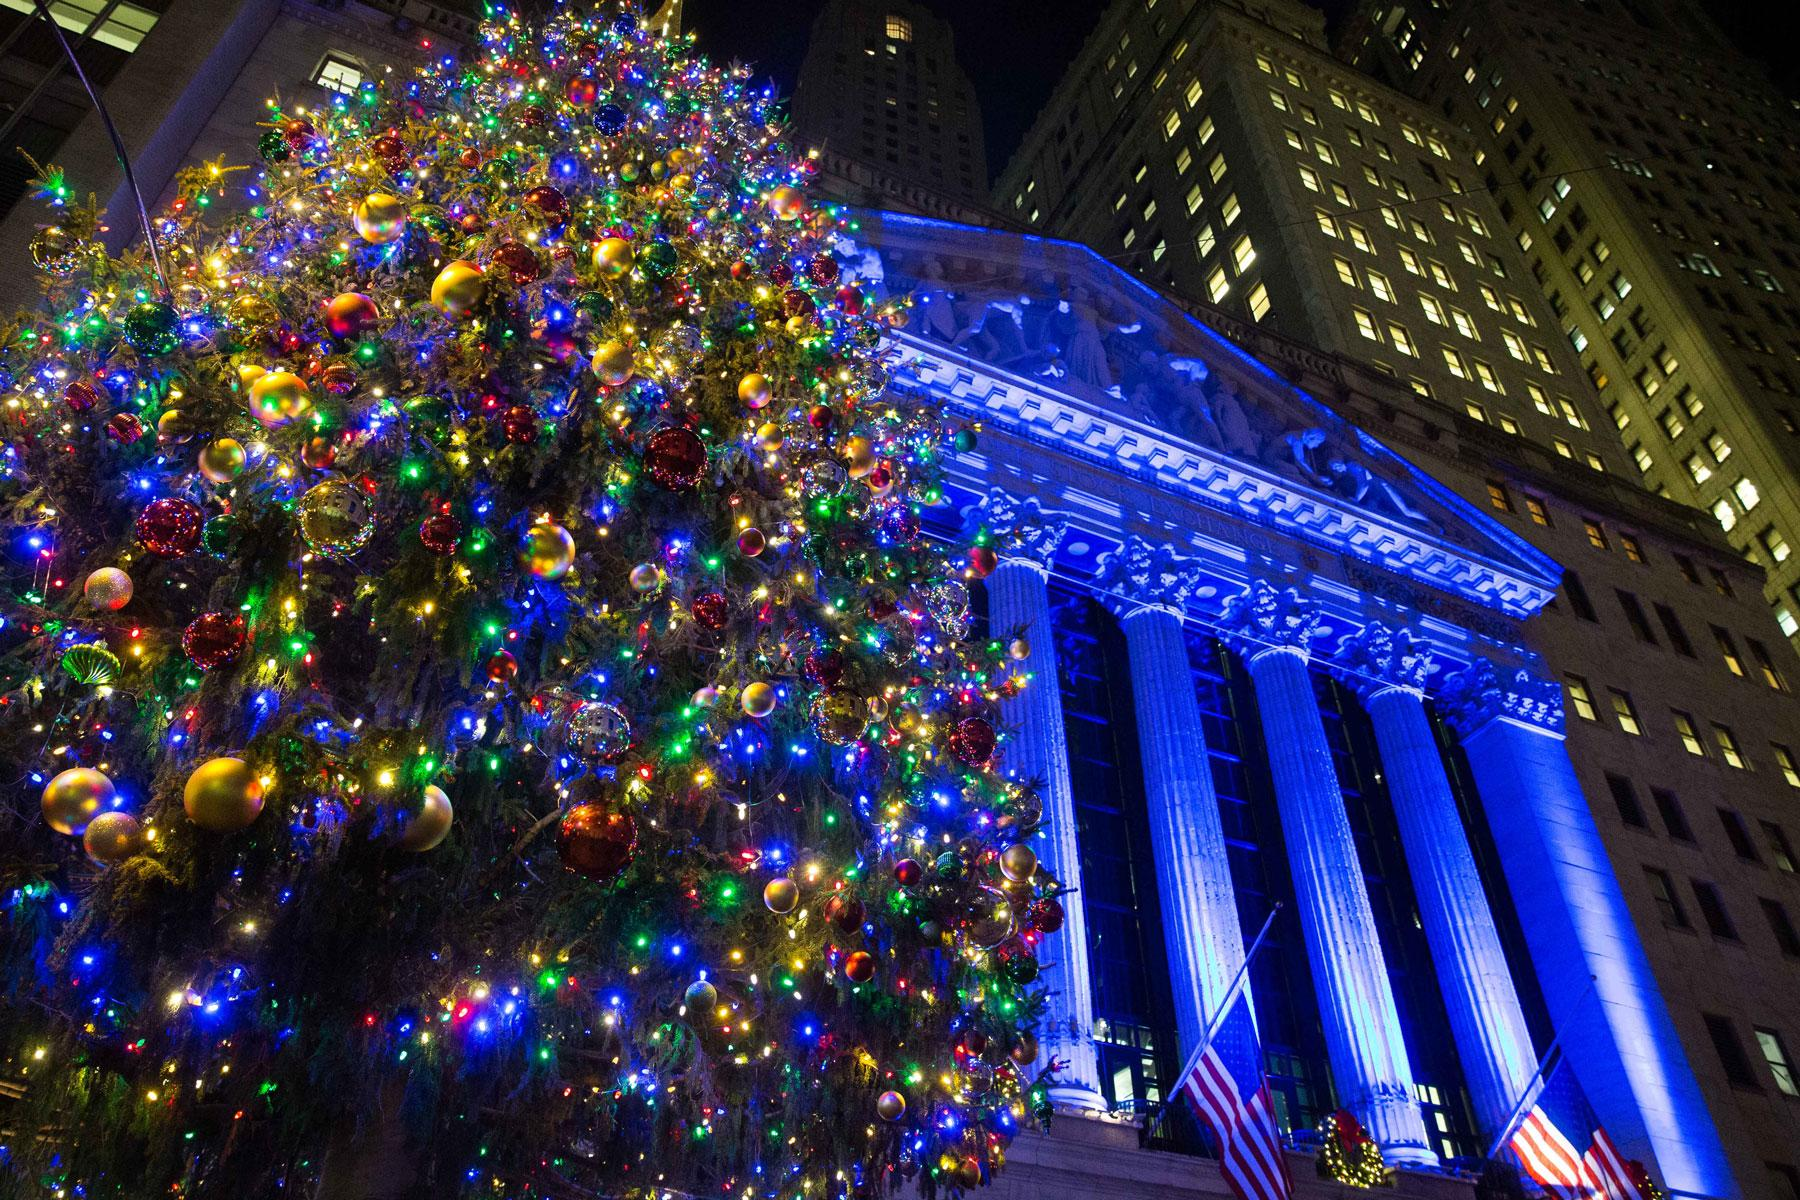 New York Christmas Decorations Taken Down